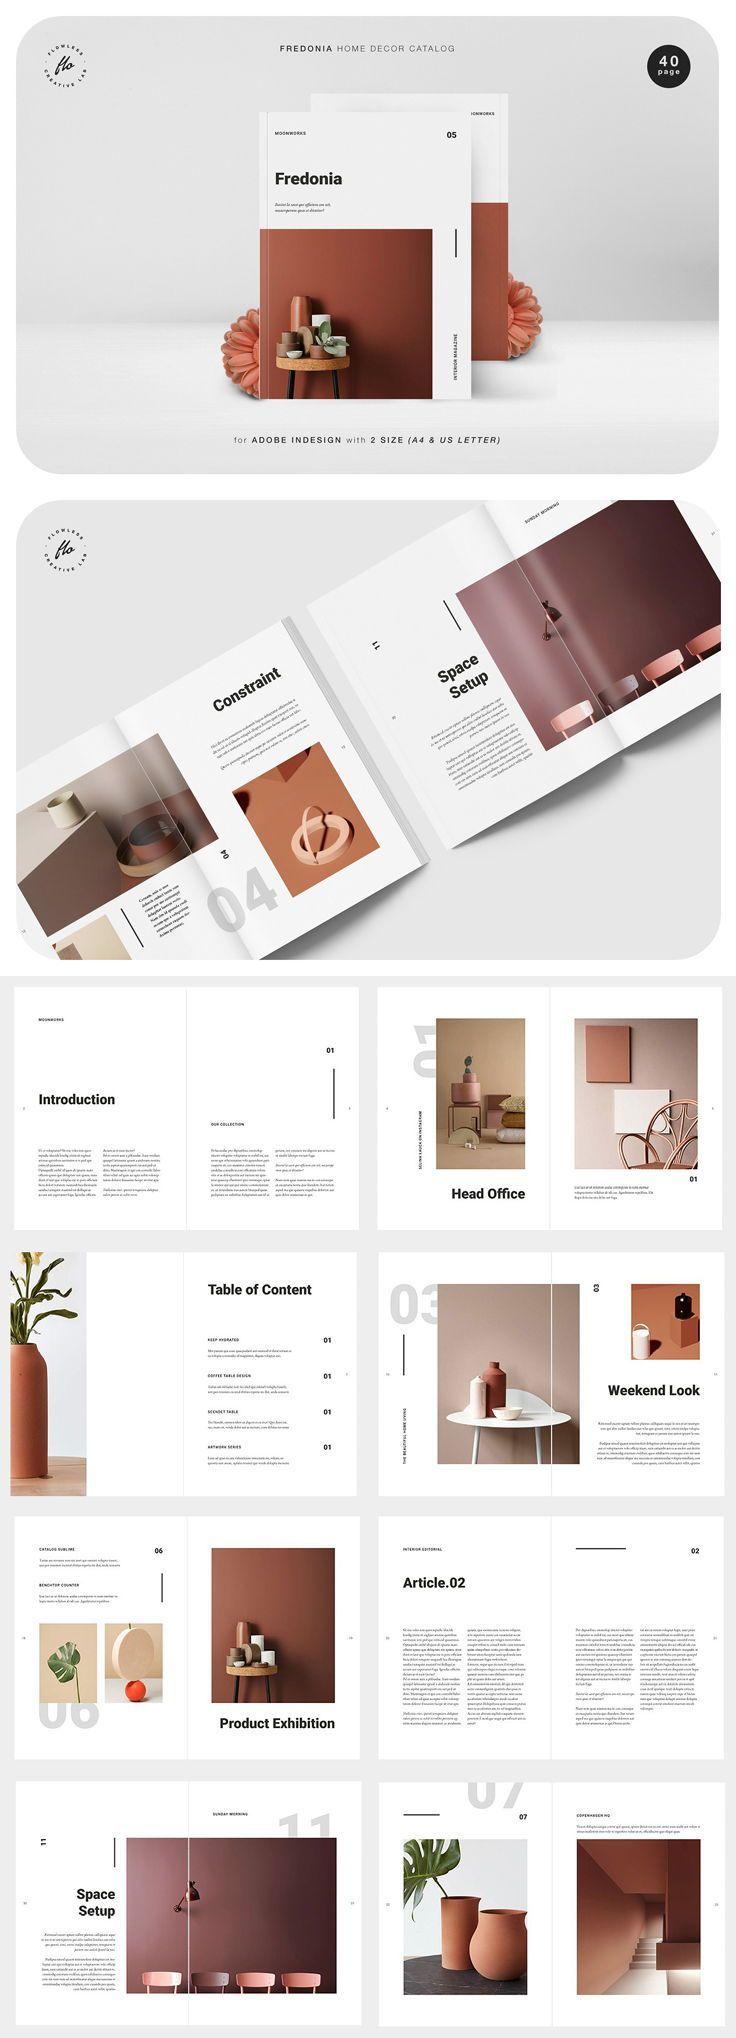 FREDONIA Home Decor Catalog - #catalog #decor #FREDONIA #Home #interiordesignmagazine